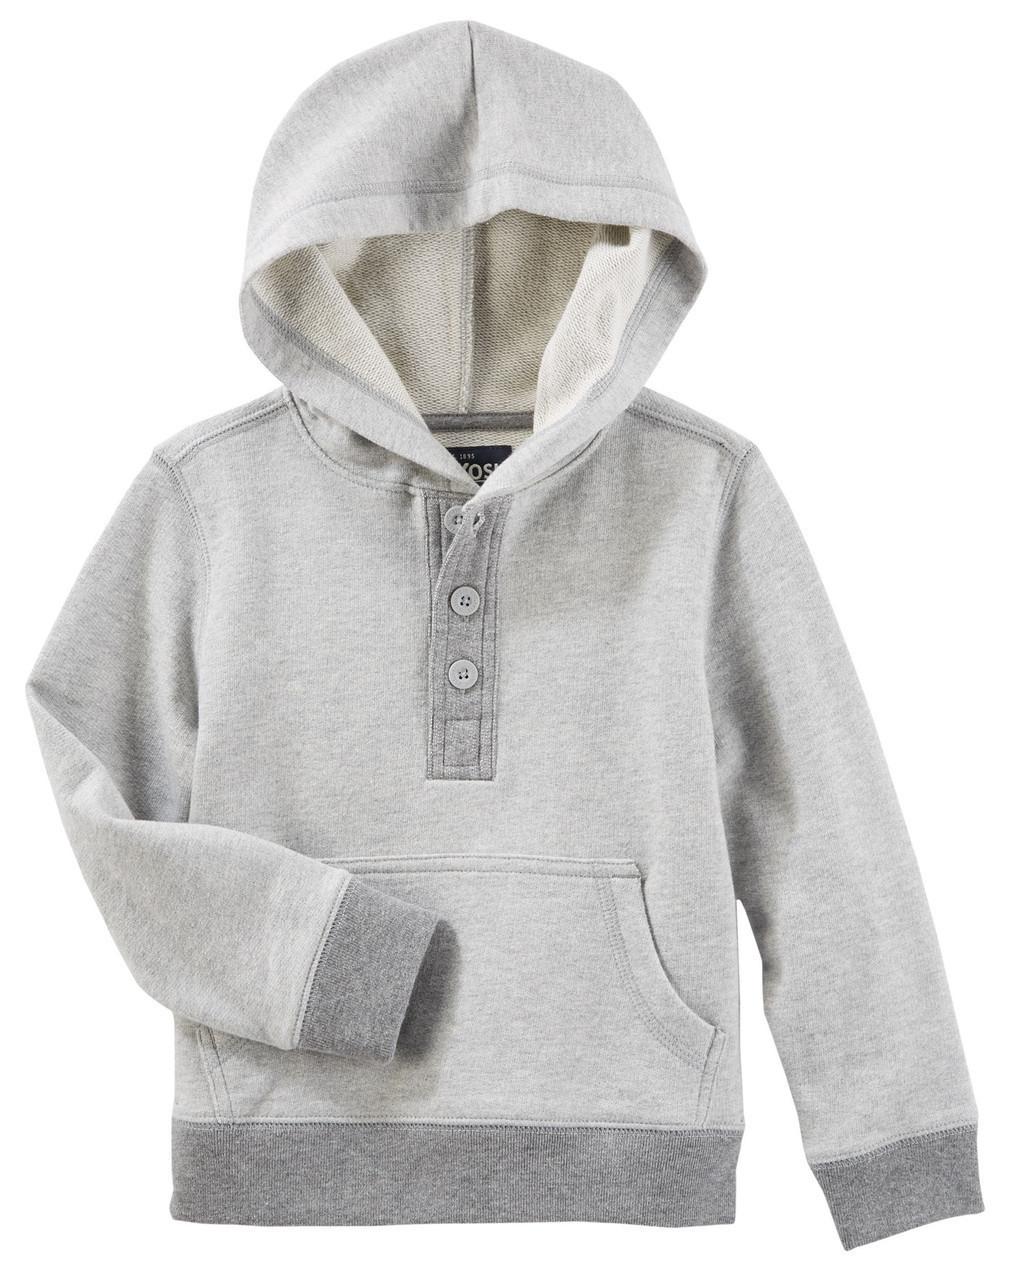 Пуловер Oshkosh French Terry 8 лет